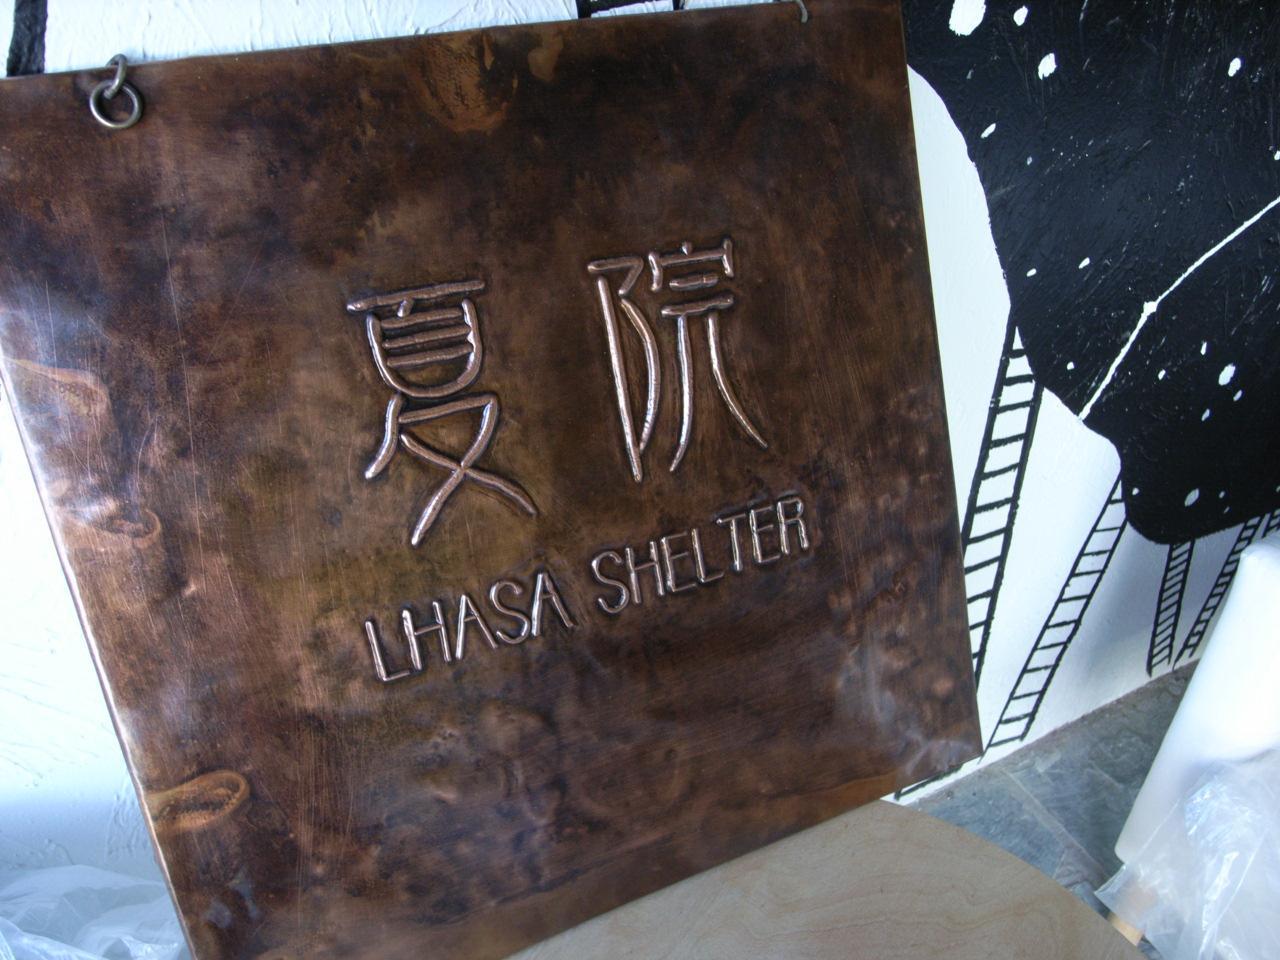 Lhasa Shelter Inn, Lhasa